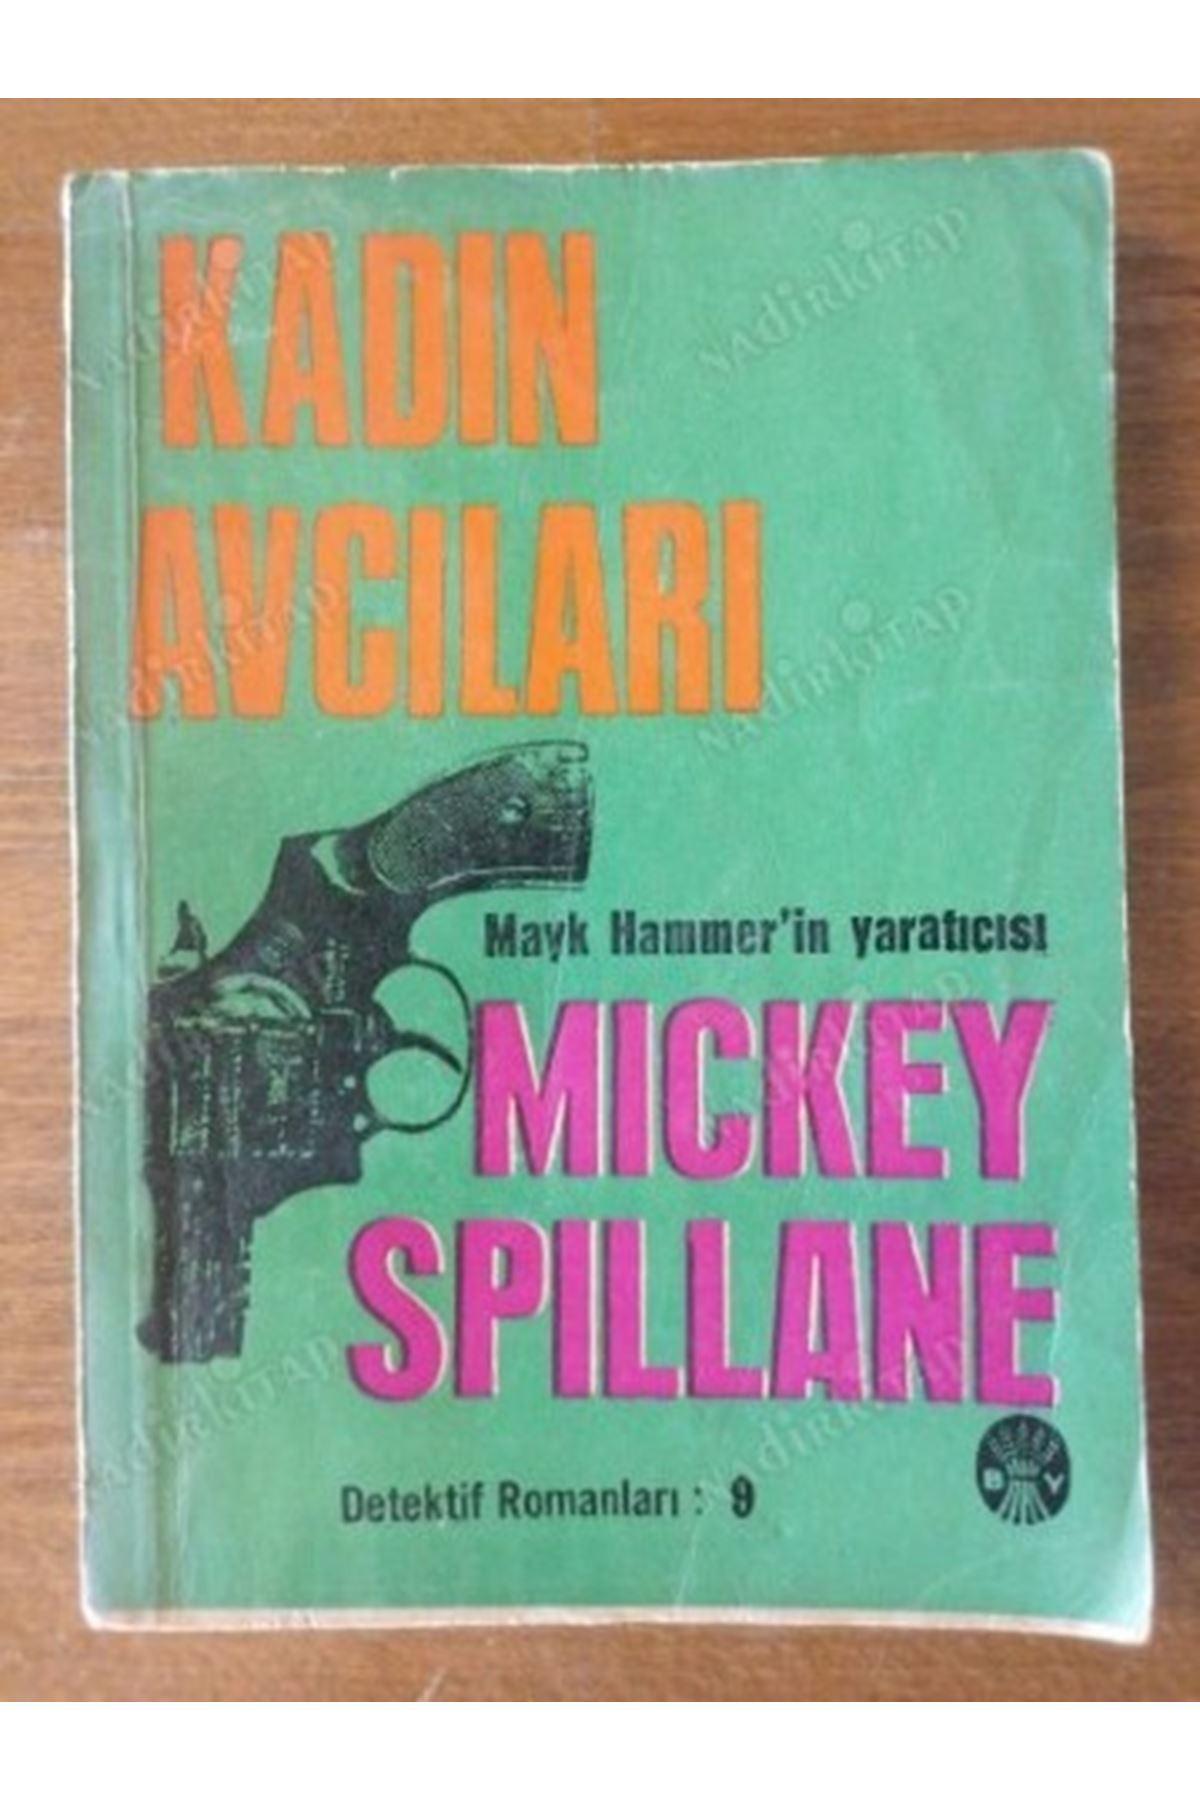 MİCKEY SPİLLANE - KADIN AVCILARI